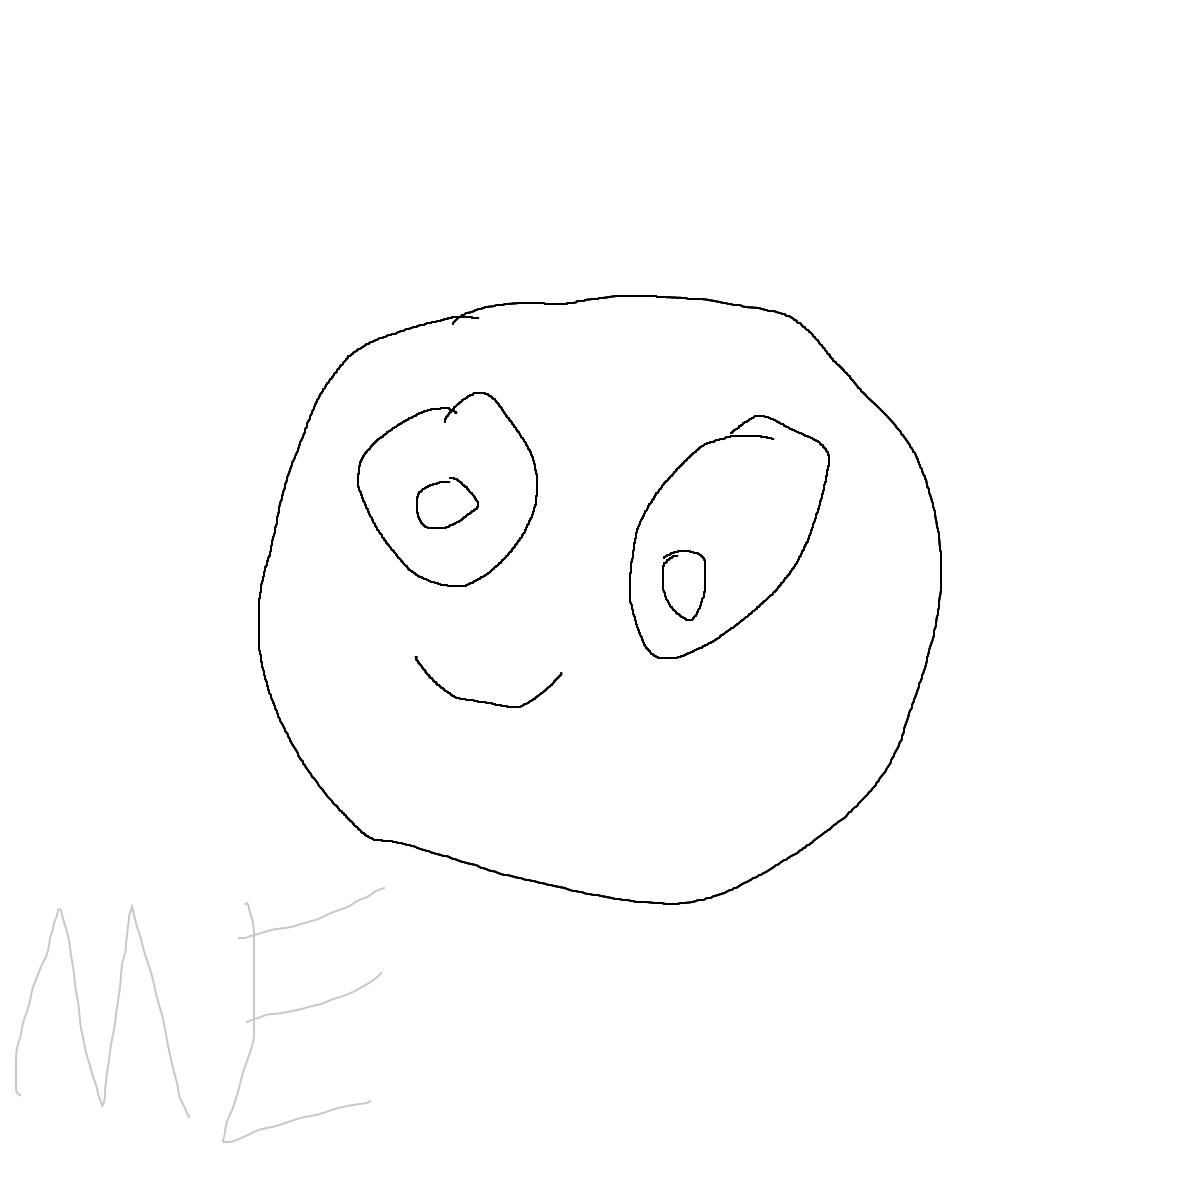 BAAAM drawing#11172 lat:-33.8338050842285160lng: 151.1221008300781200